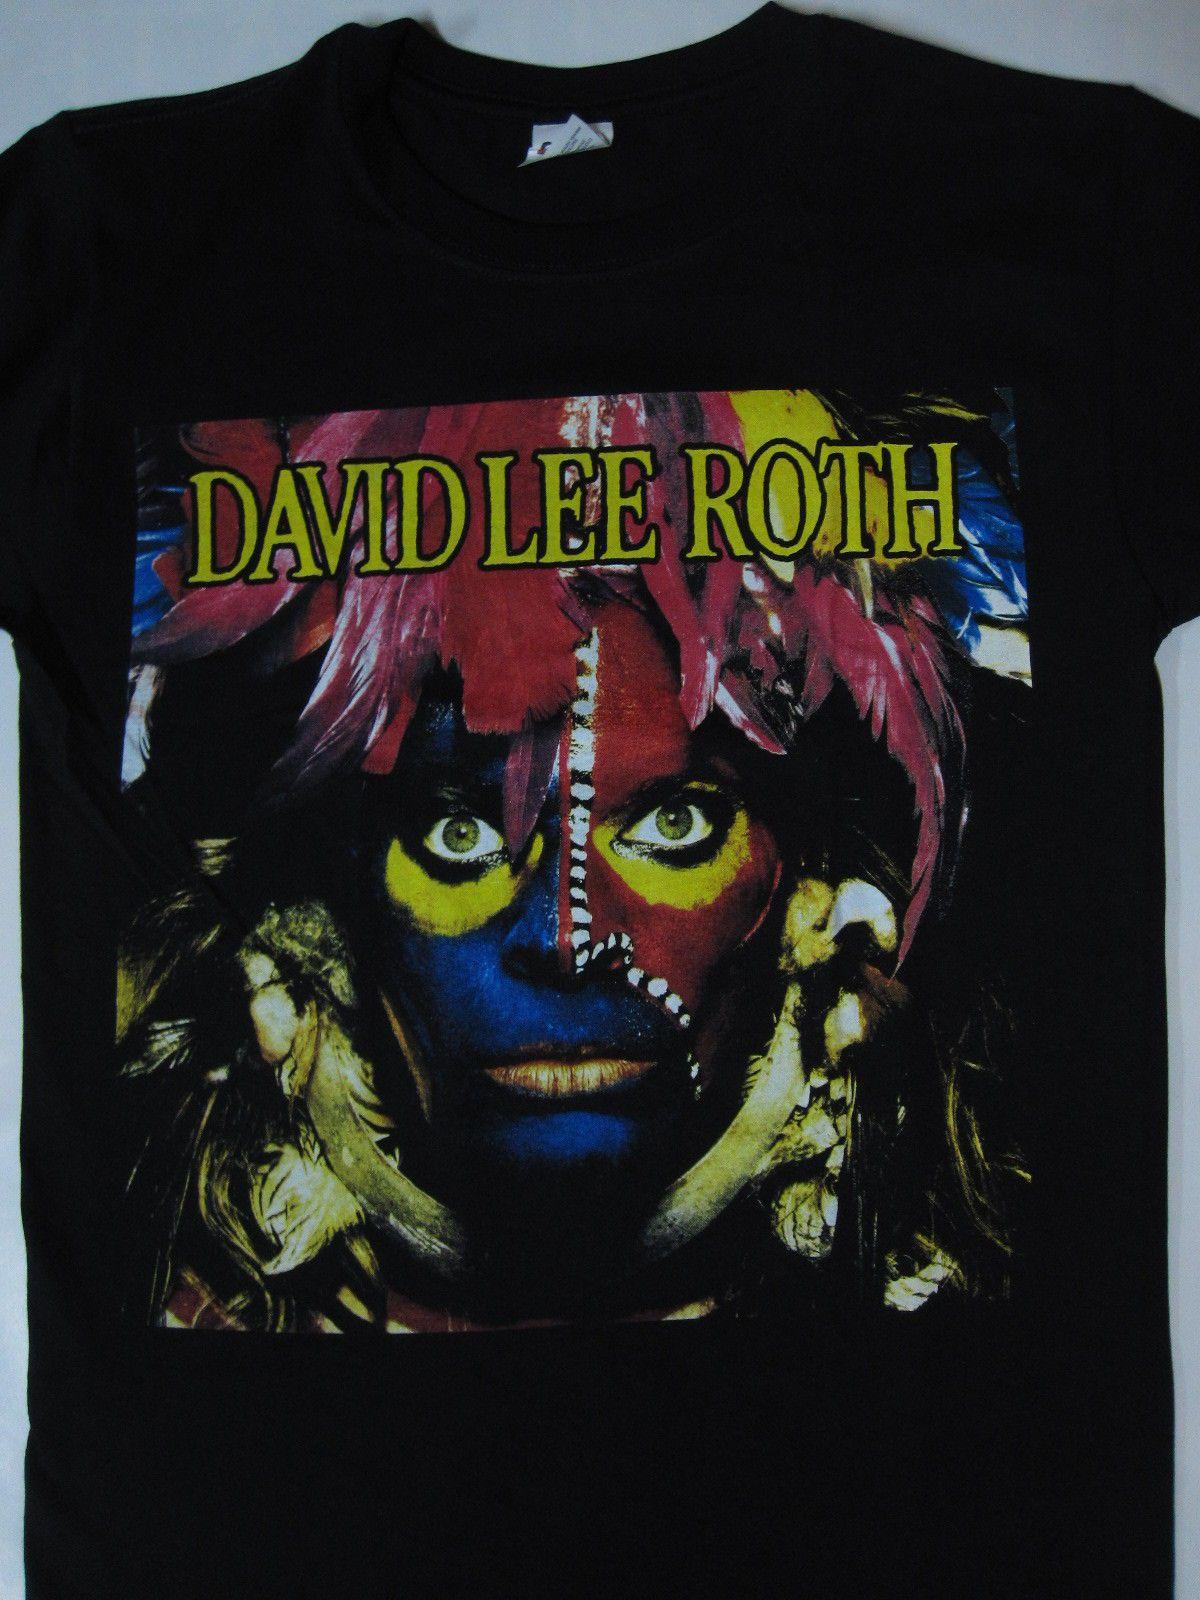 David Lee Roth Eat Em And Smile Tour T Shirt S Xxl David Lee Roth David Lee Tour T Shirts